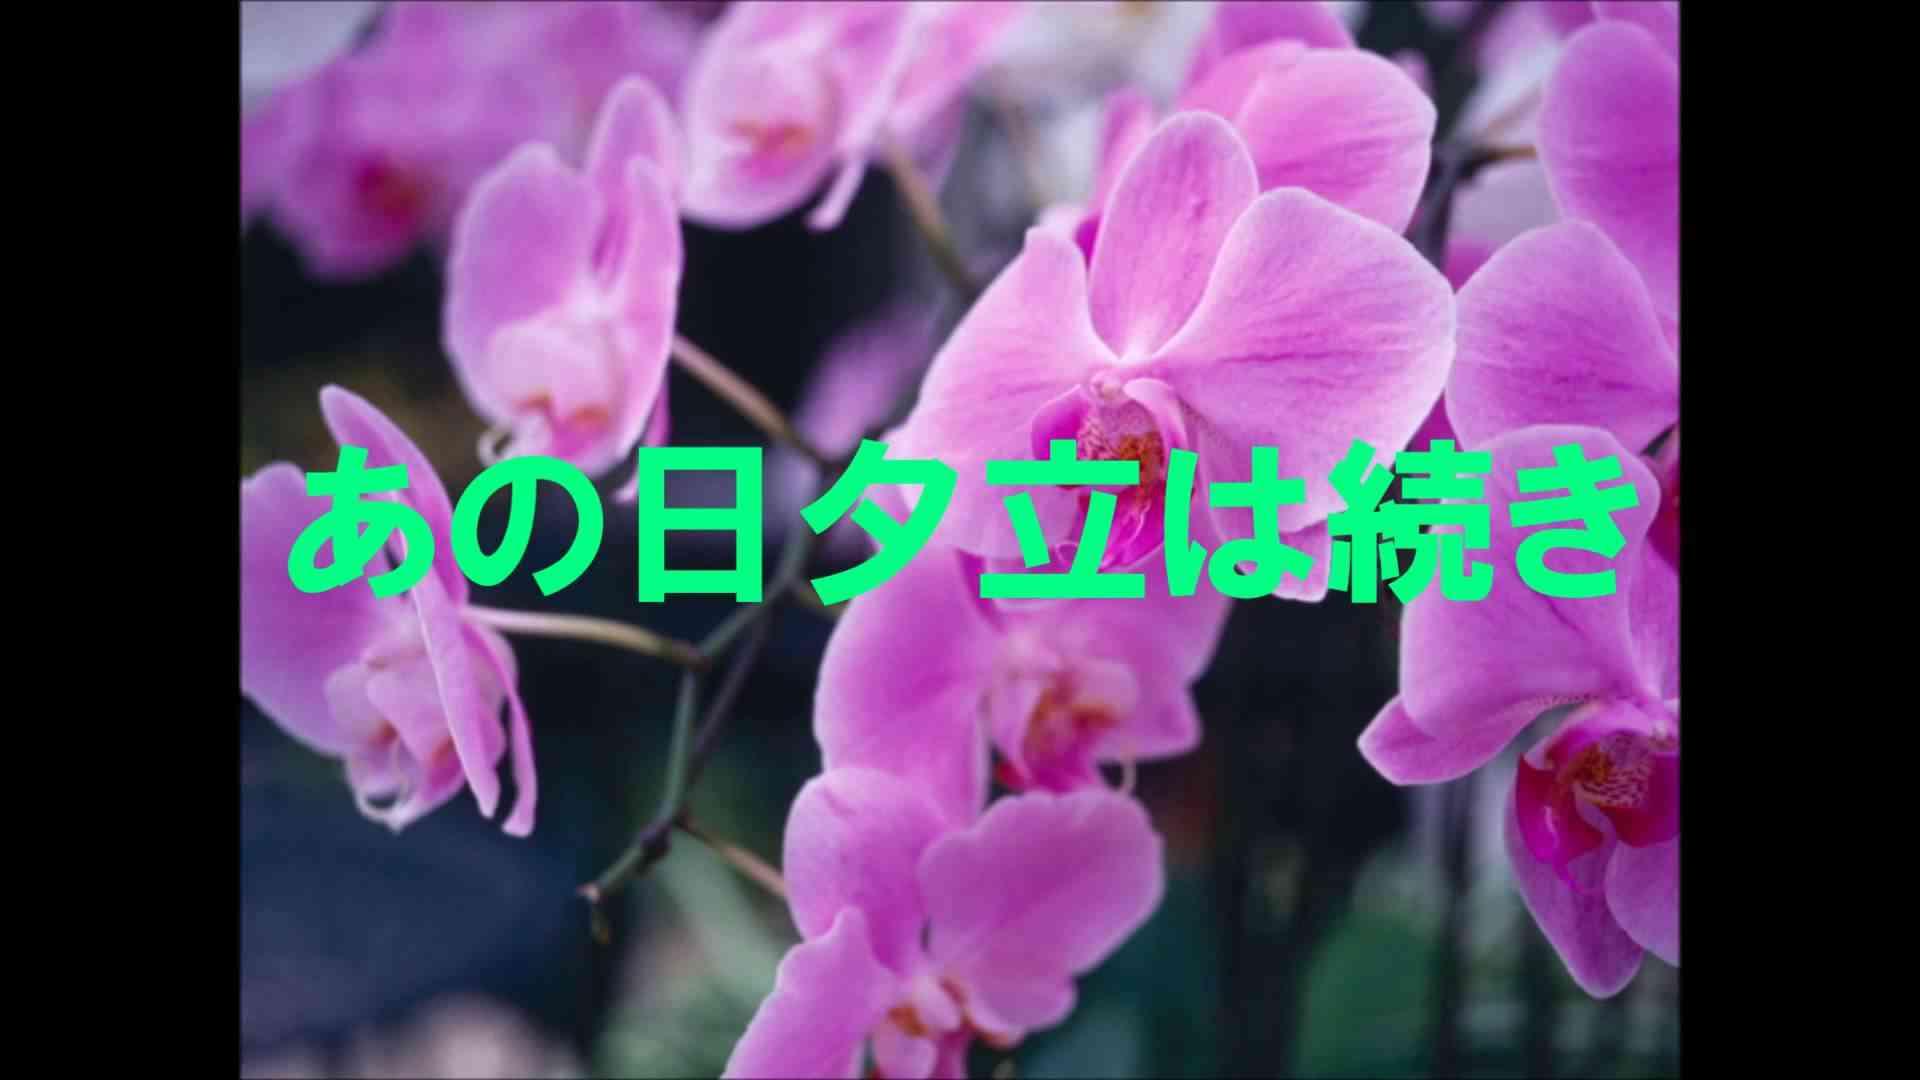 GARNET CROW 夕立の庭 - YouTube